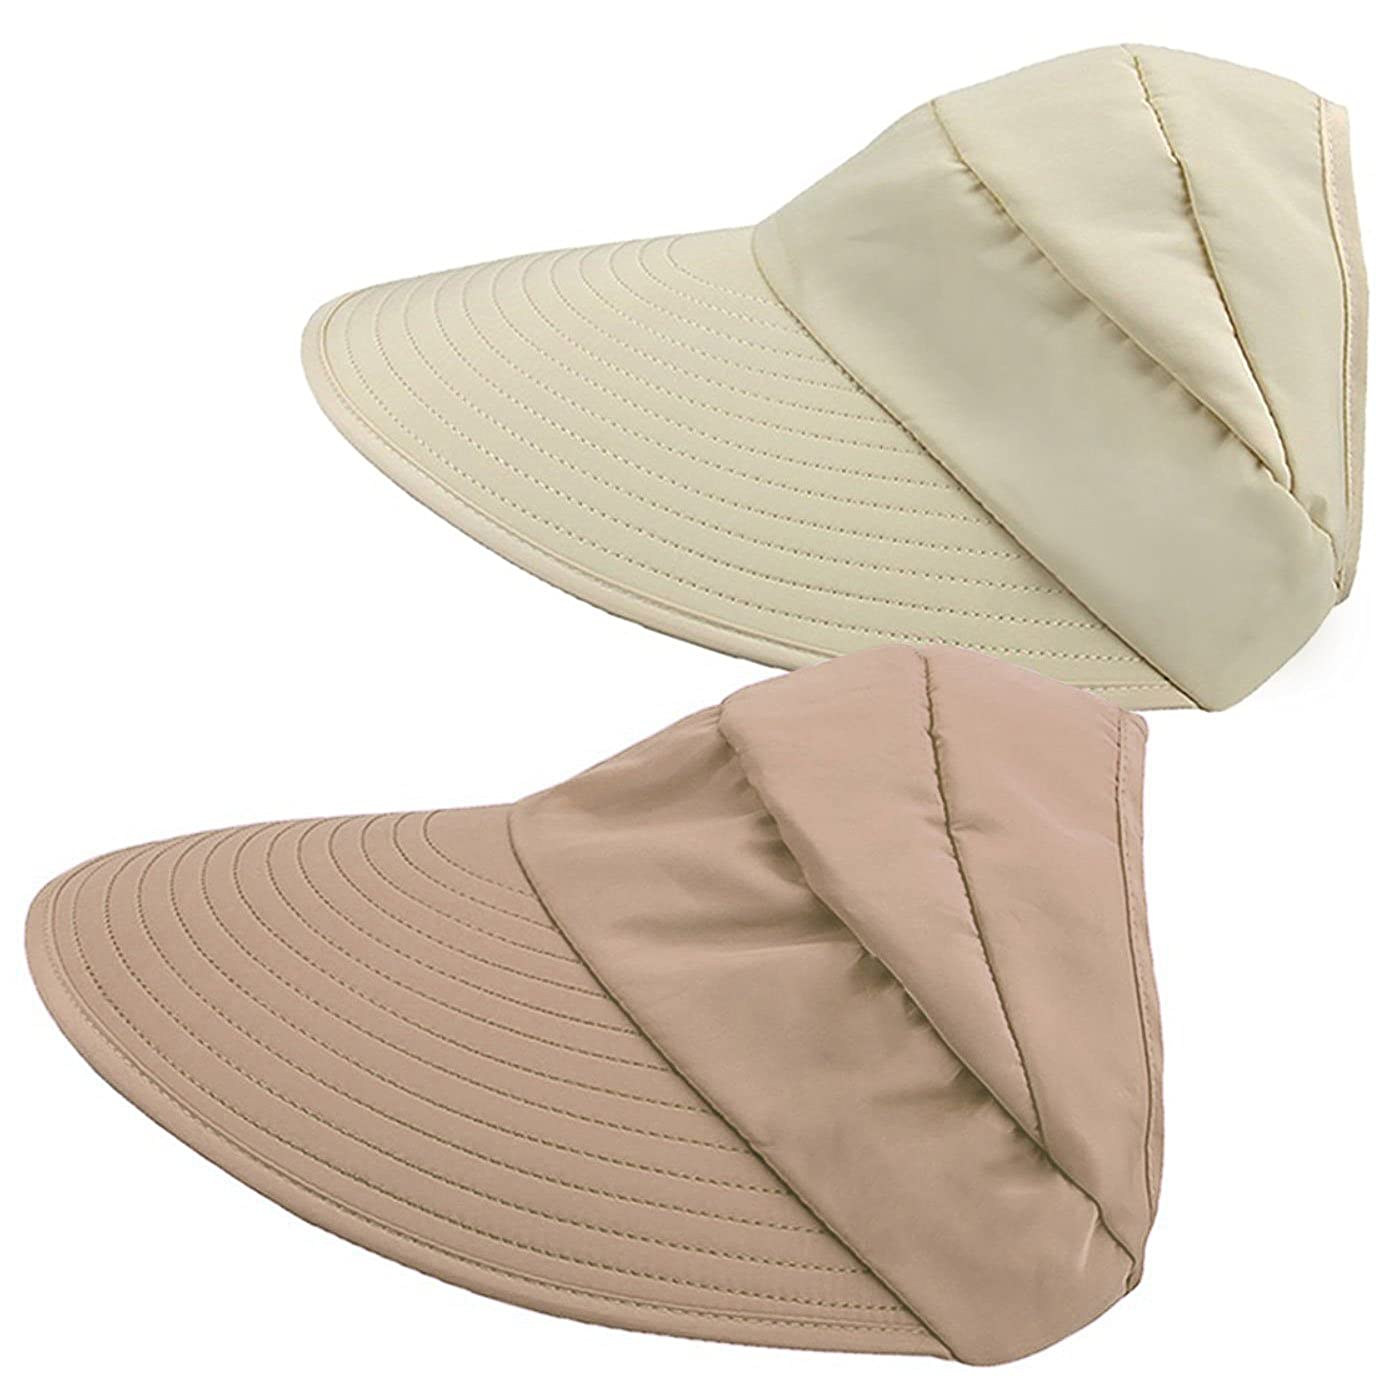 _Beige+ Khaki HINDAWI Women Winter Warm Knit Hat Wool Snow Ski Caps with Visor